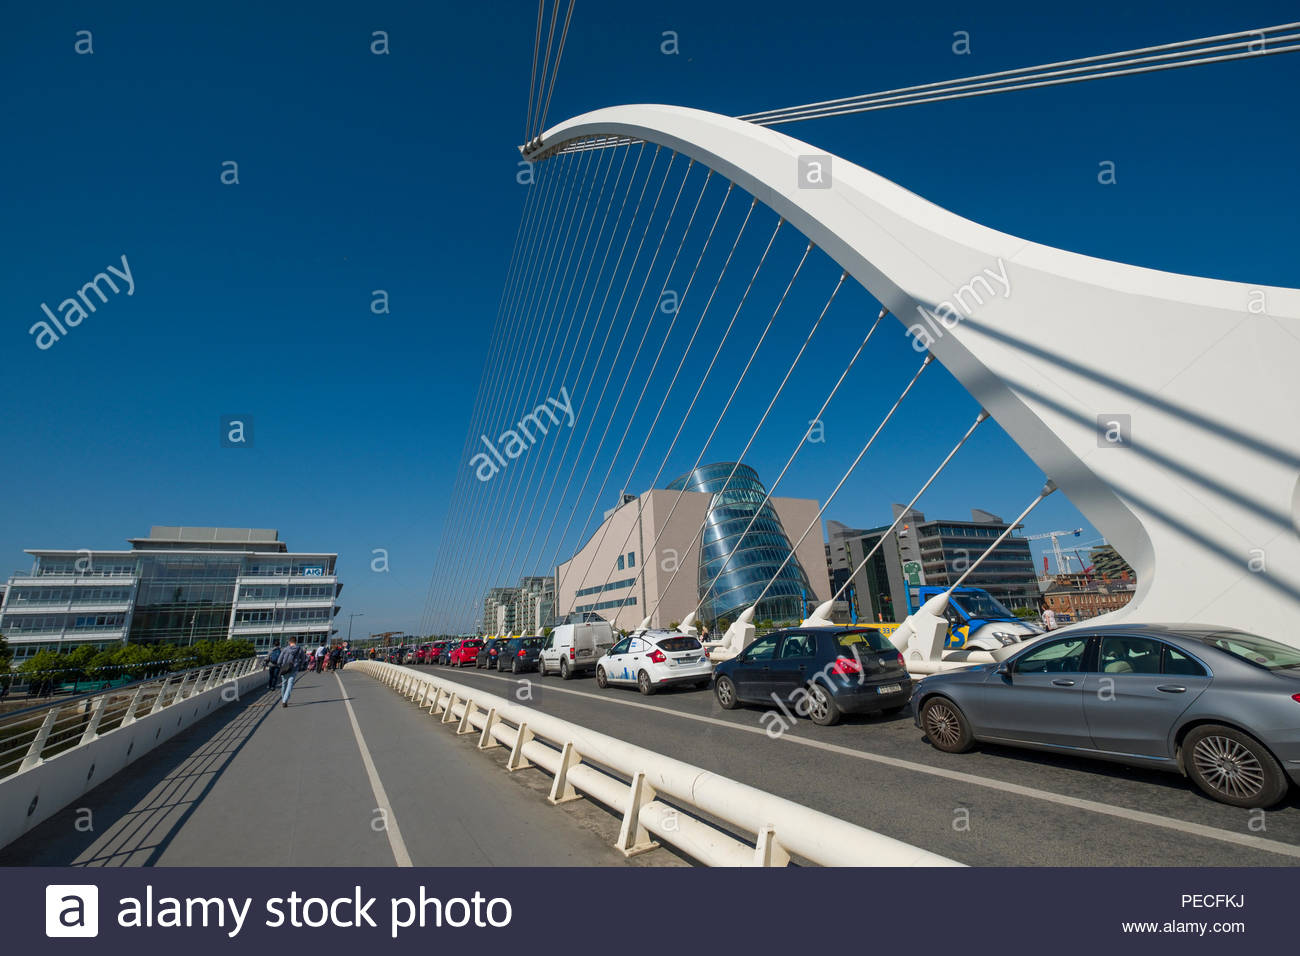 Automobile traffic on the Samuel Beckett Bridge, Dublin, Leinster, Ireland - Stock Image